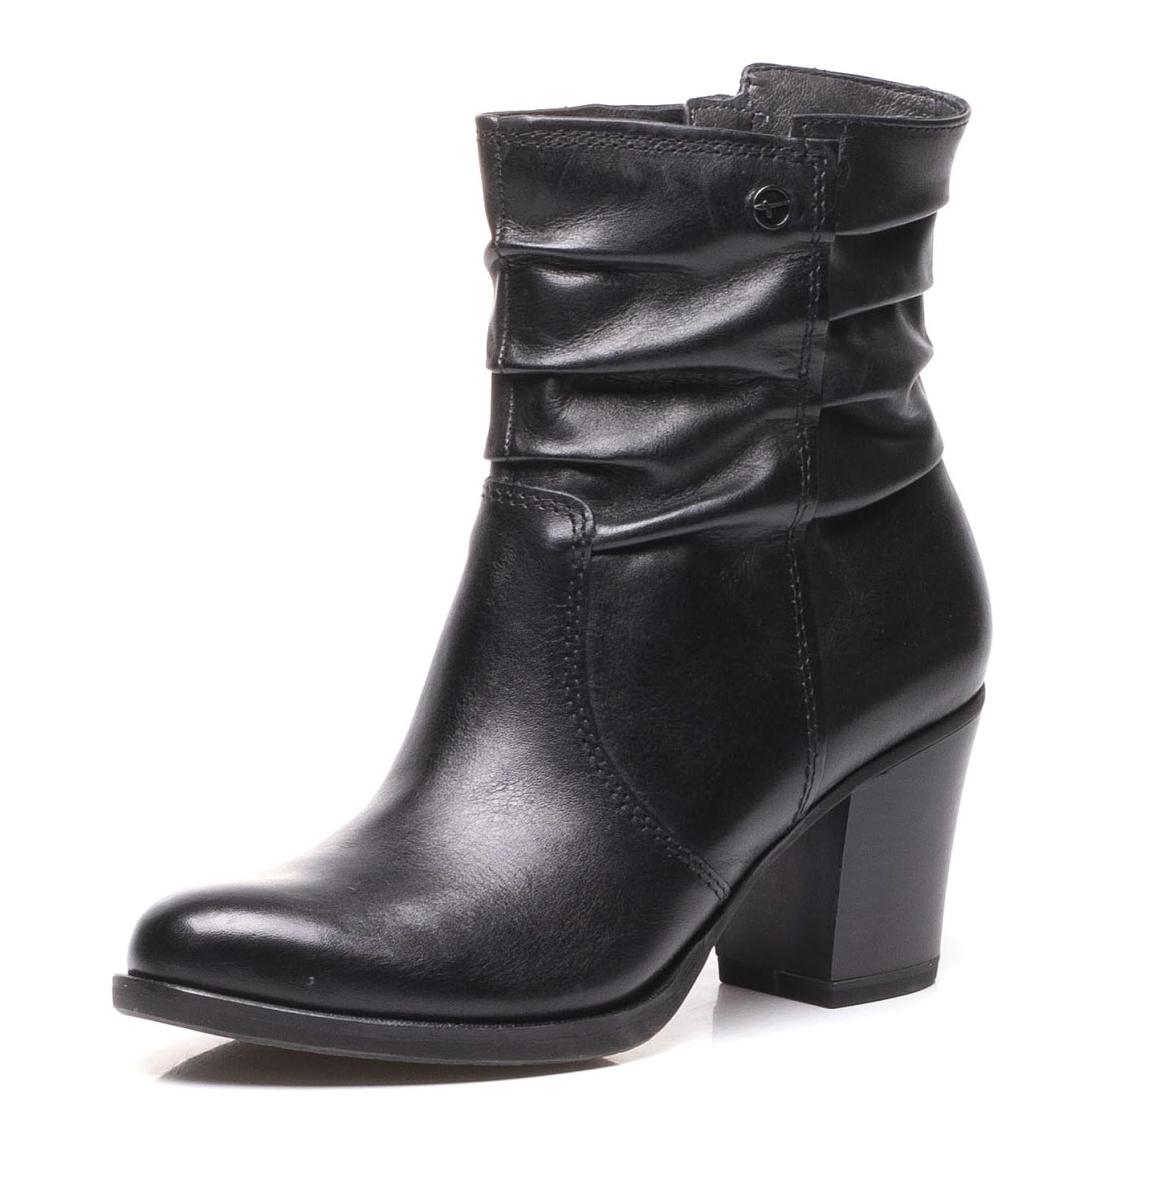 5d9fa5046506 detail Dámská obuv TAMARIS 1-1-25341-21 BLACK 001